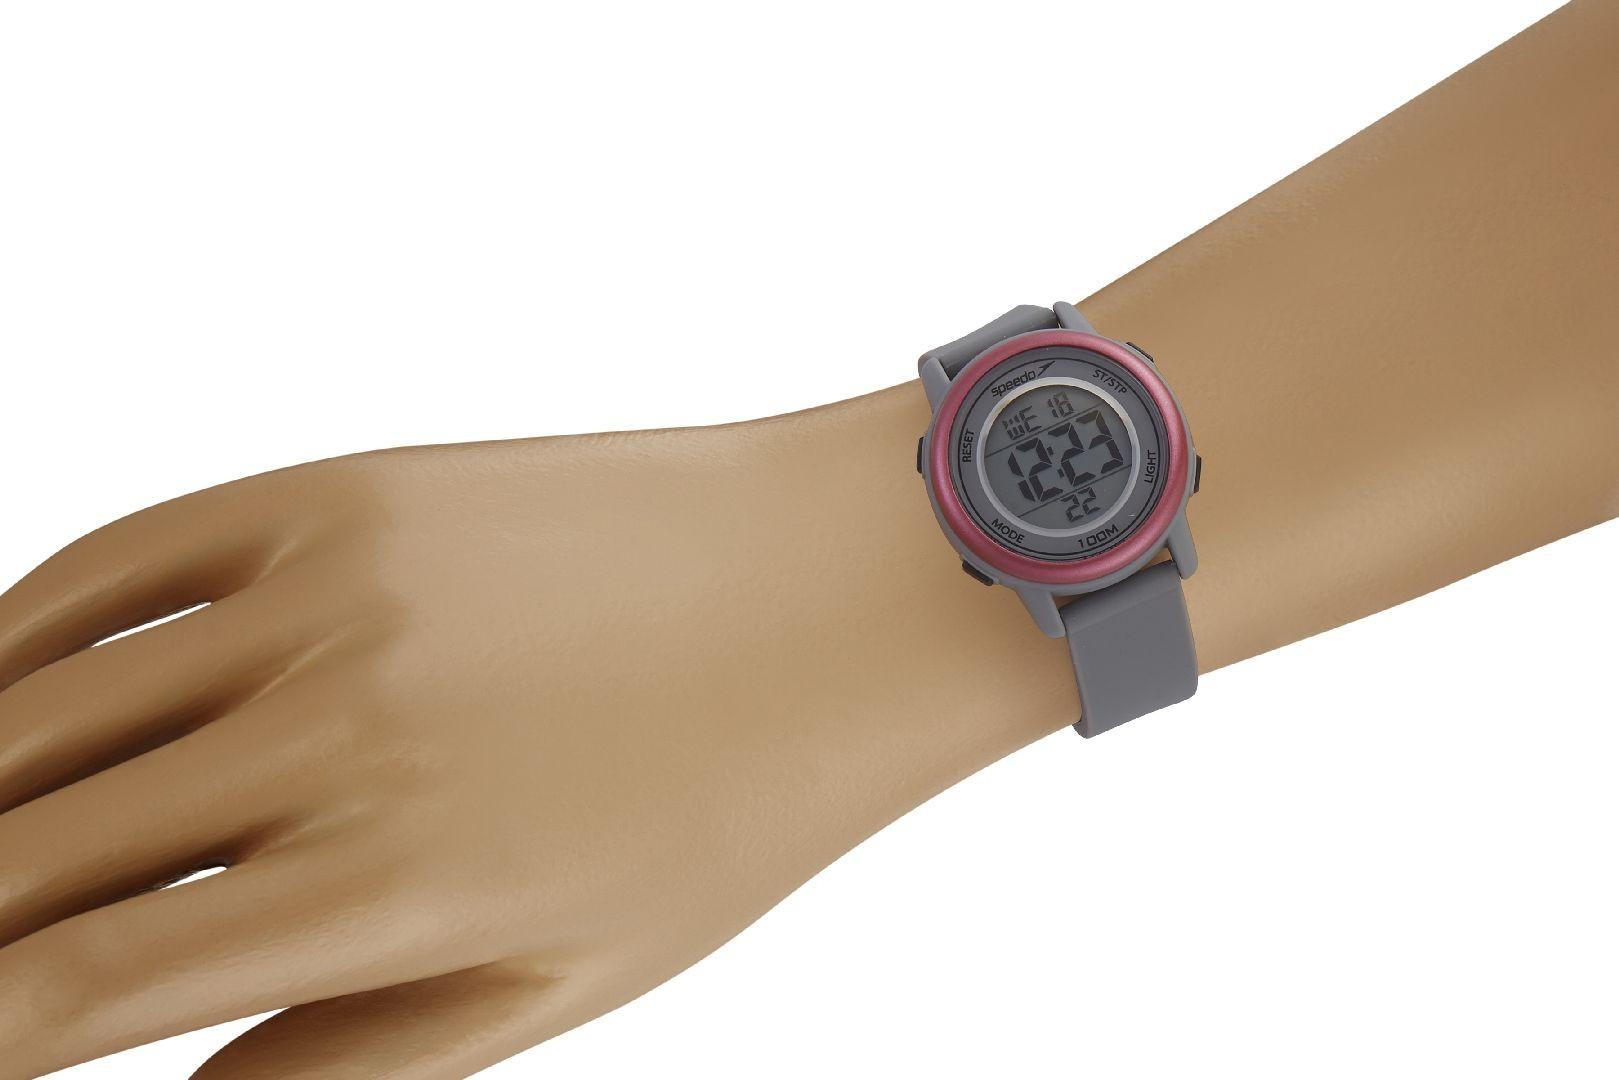 Relógio Feminino Speedo Pulseira de Poliuretano Cinza Fundo LCD Positivo